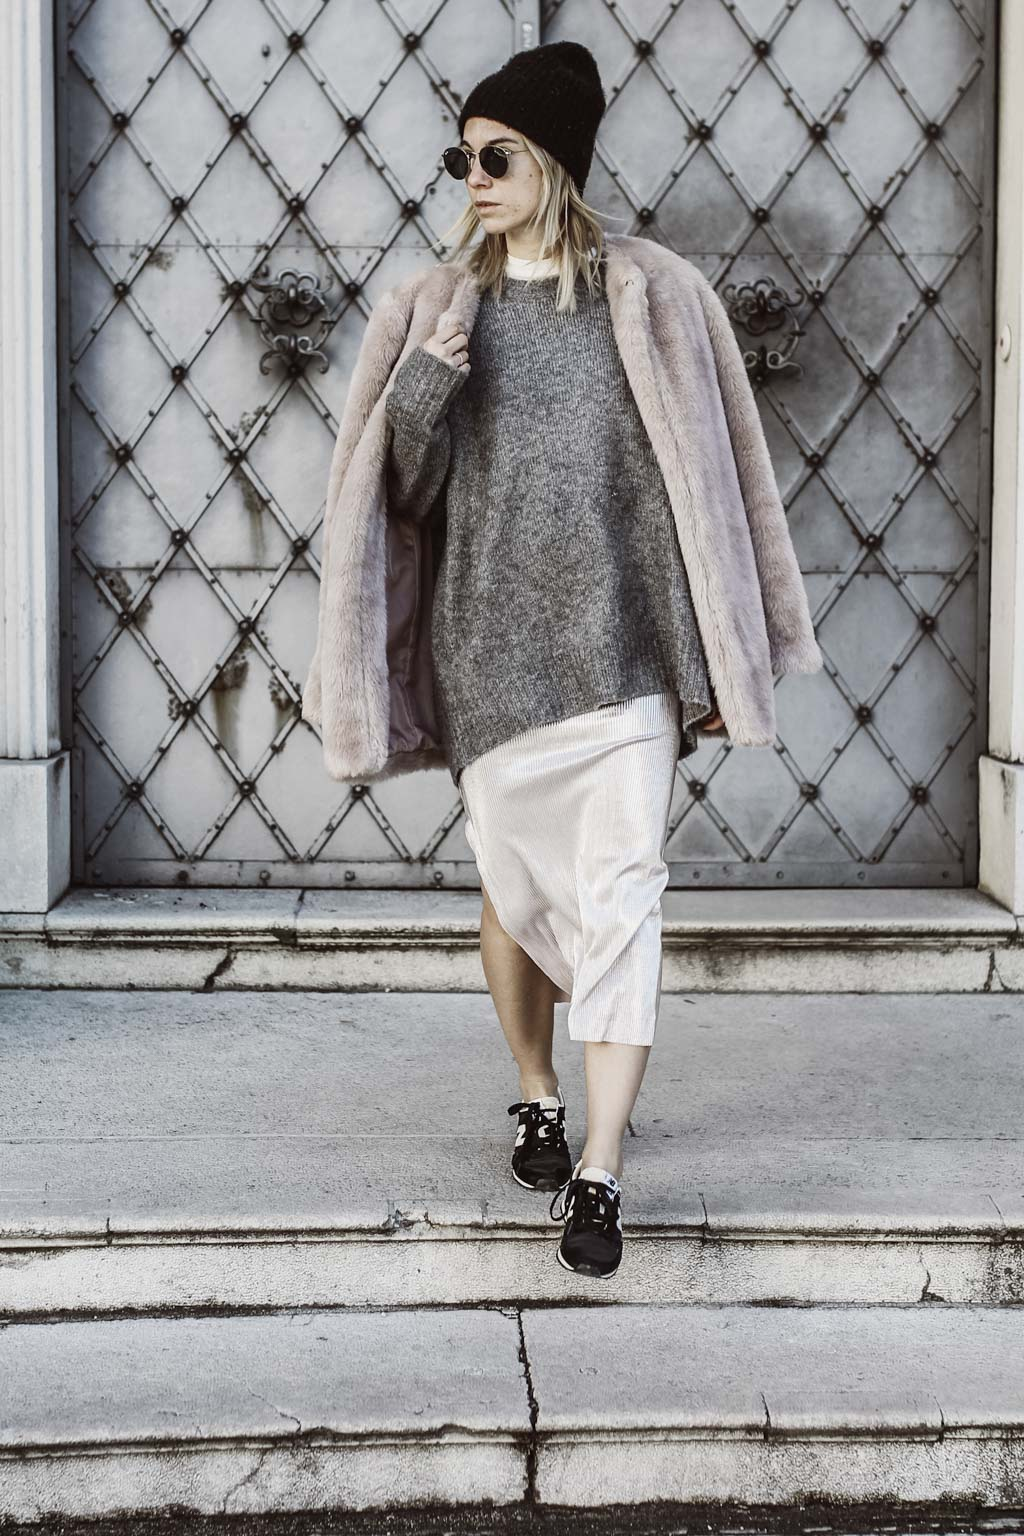 Karin Kaswurm auf Salzburgs Straßen im Oversize Look